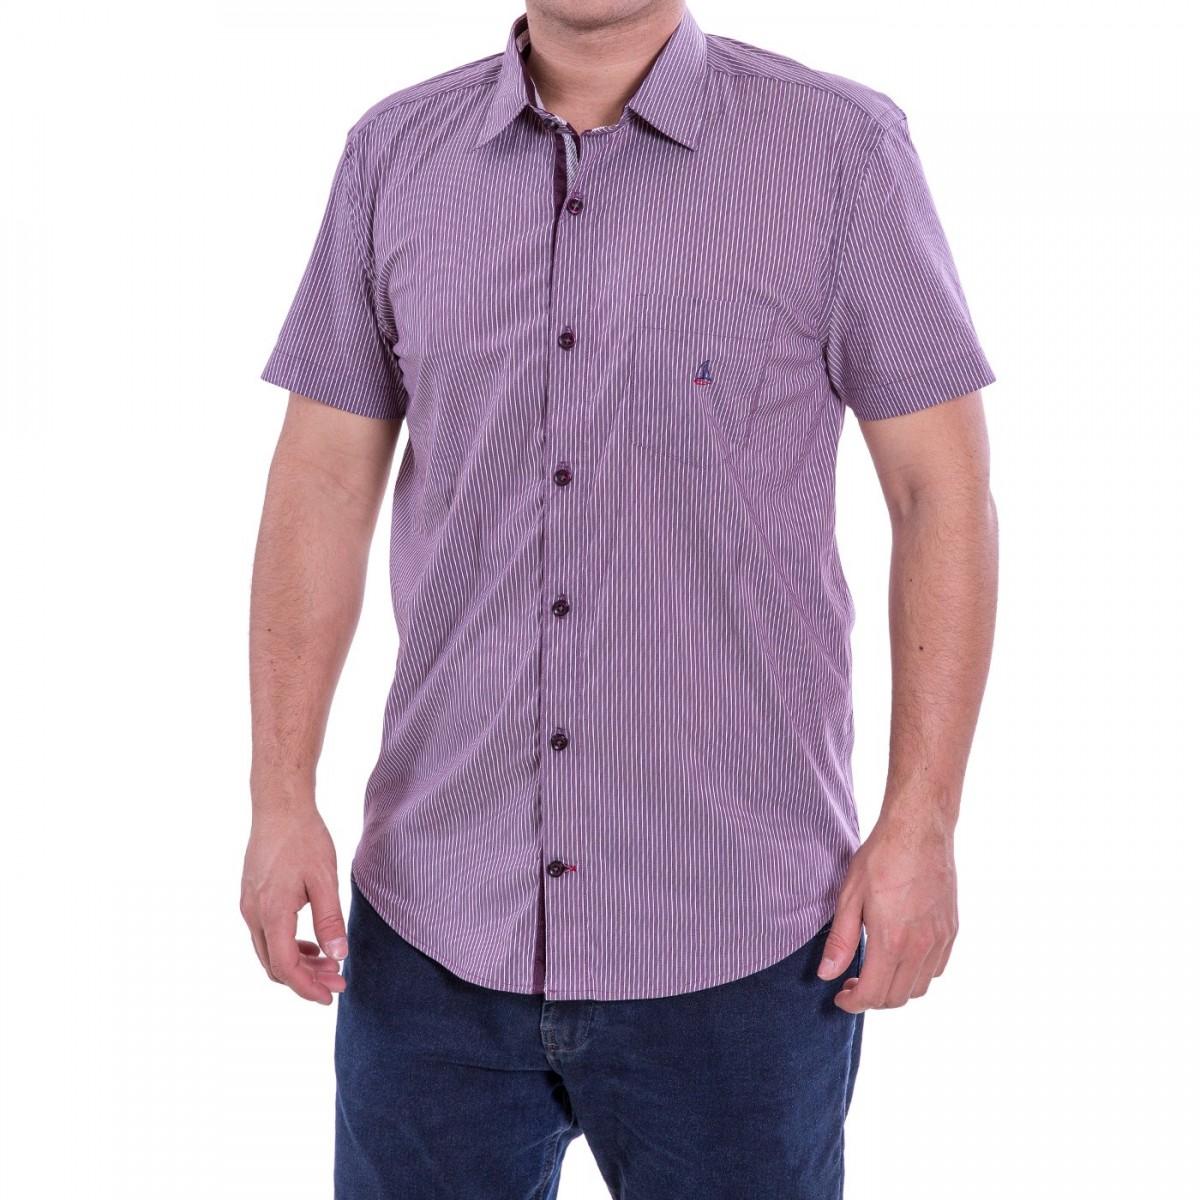 96ae1ca83cc77 Bizz Store - Camisa Masculina Porto CO Slim Manga Curta Listrada